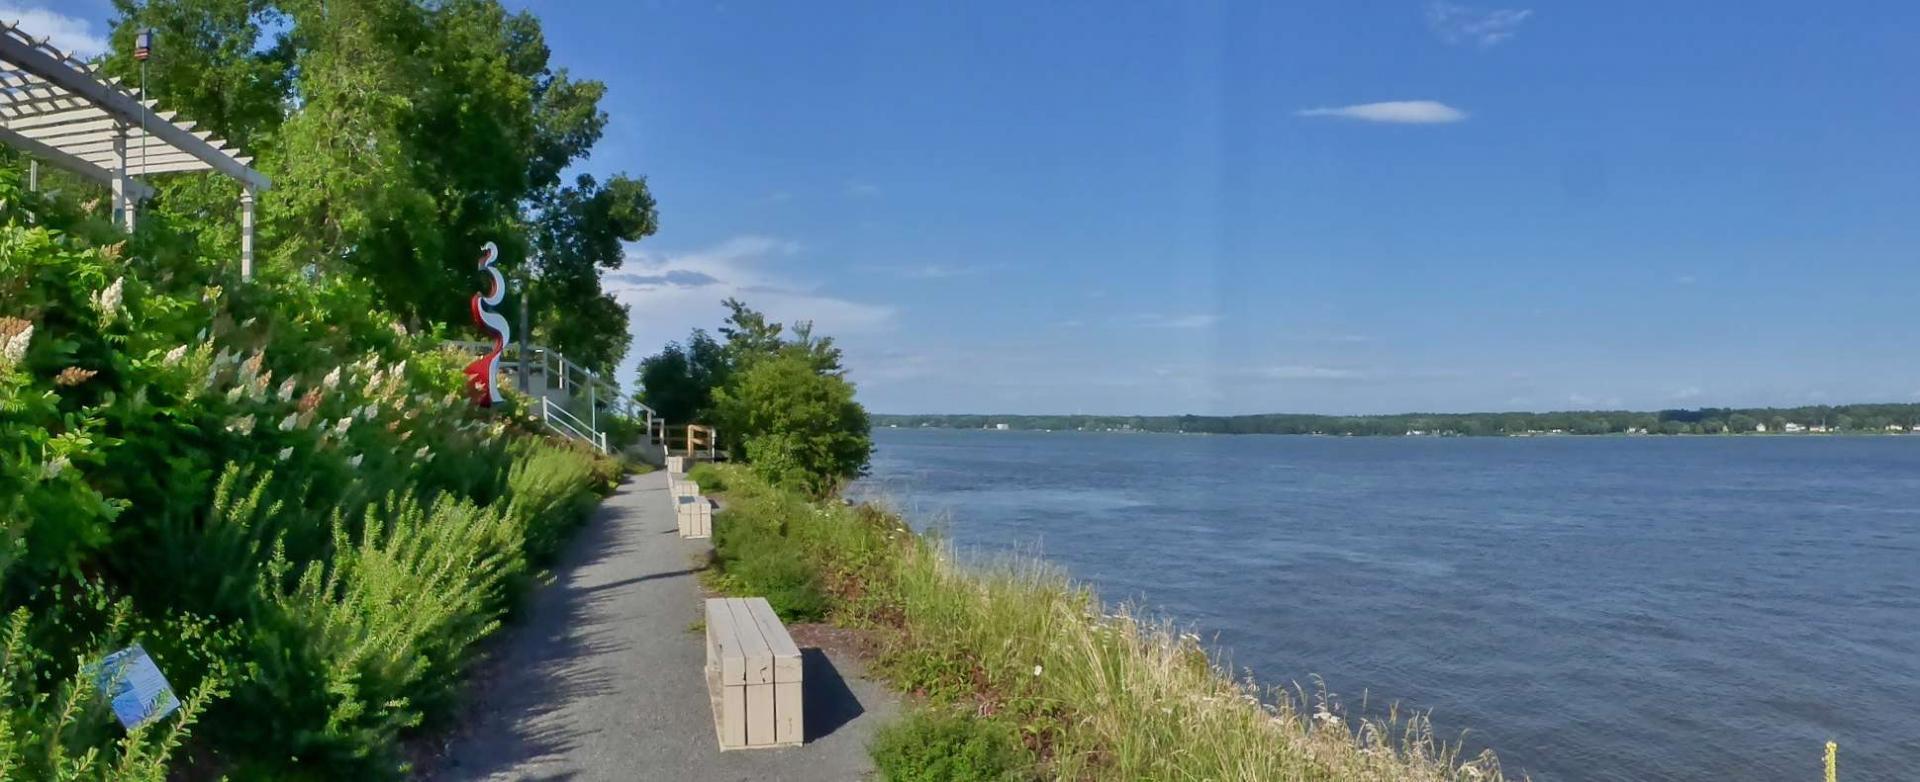 Promenade sur le fleuve, Lanoraie